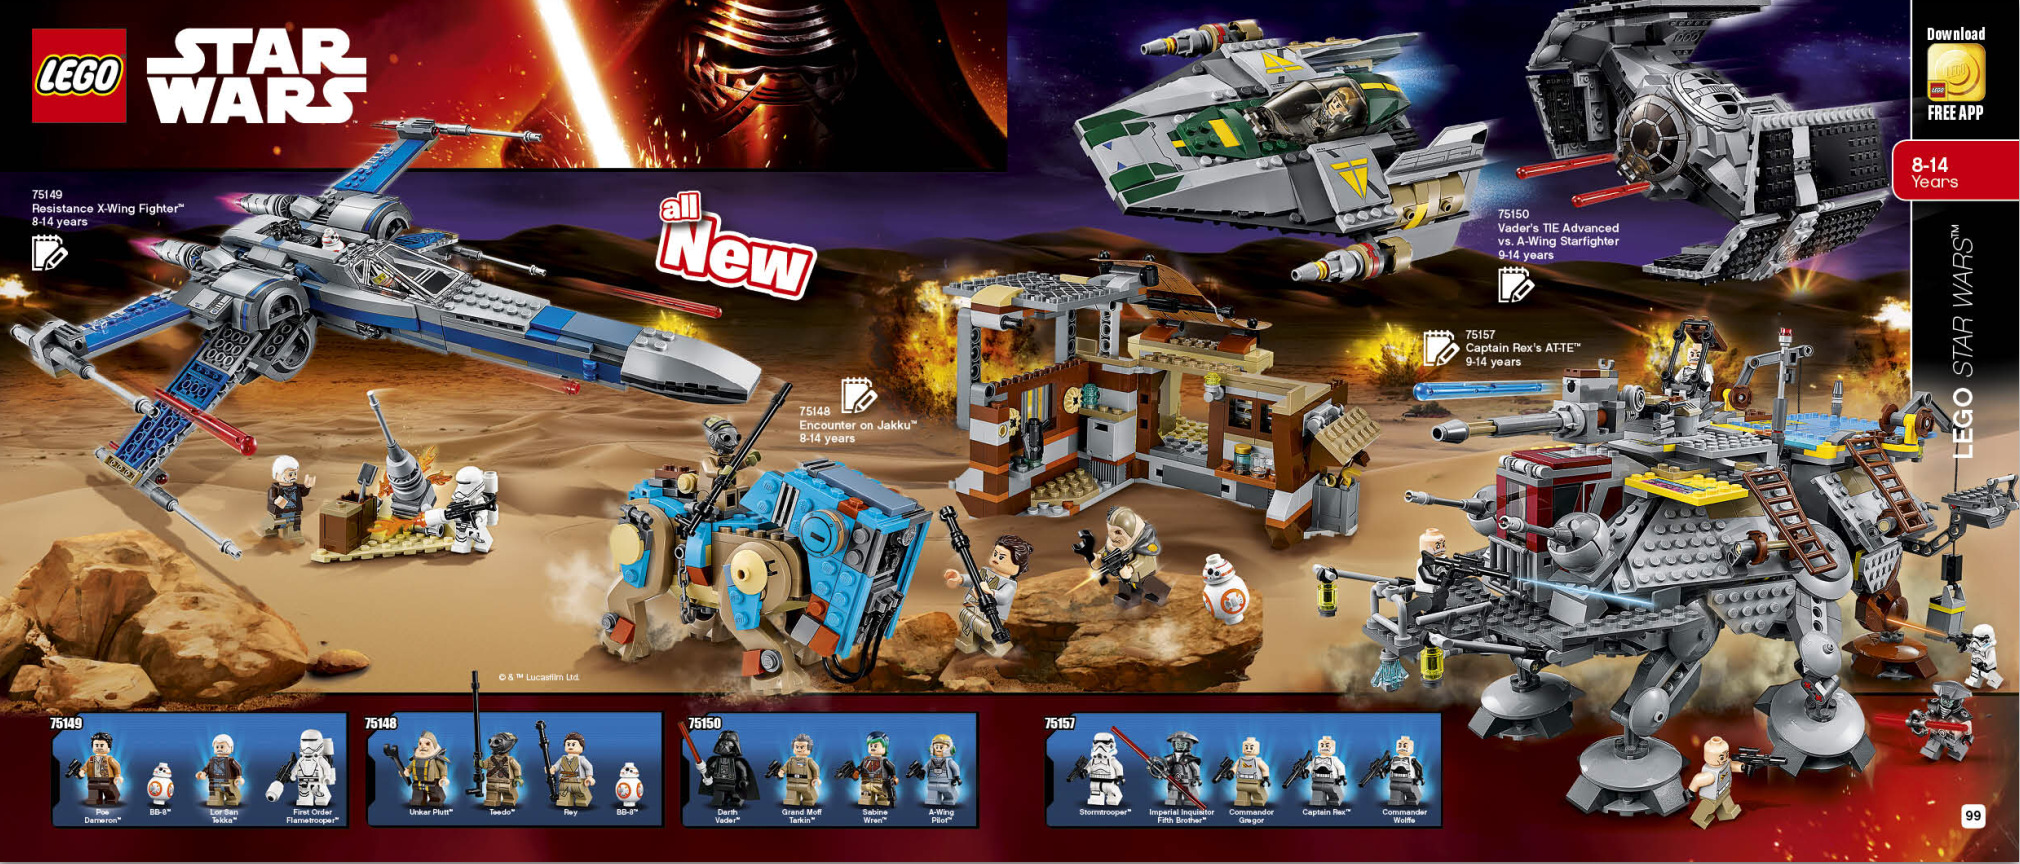 Lego star wars sets 2016 winter